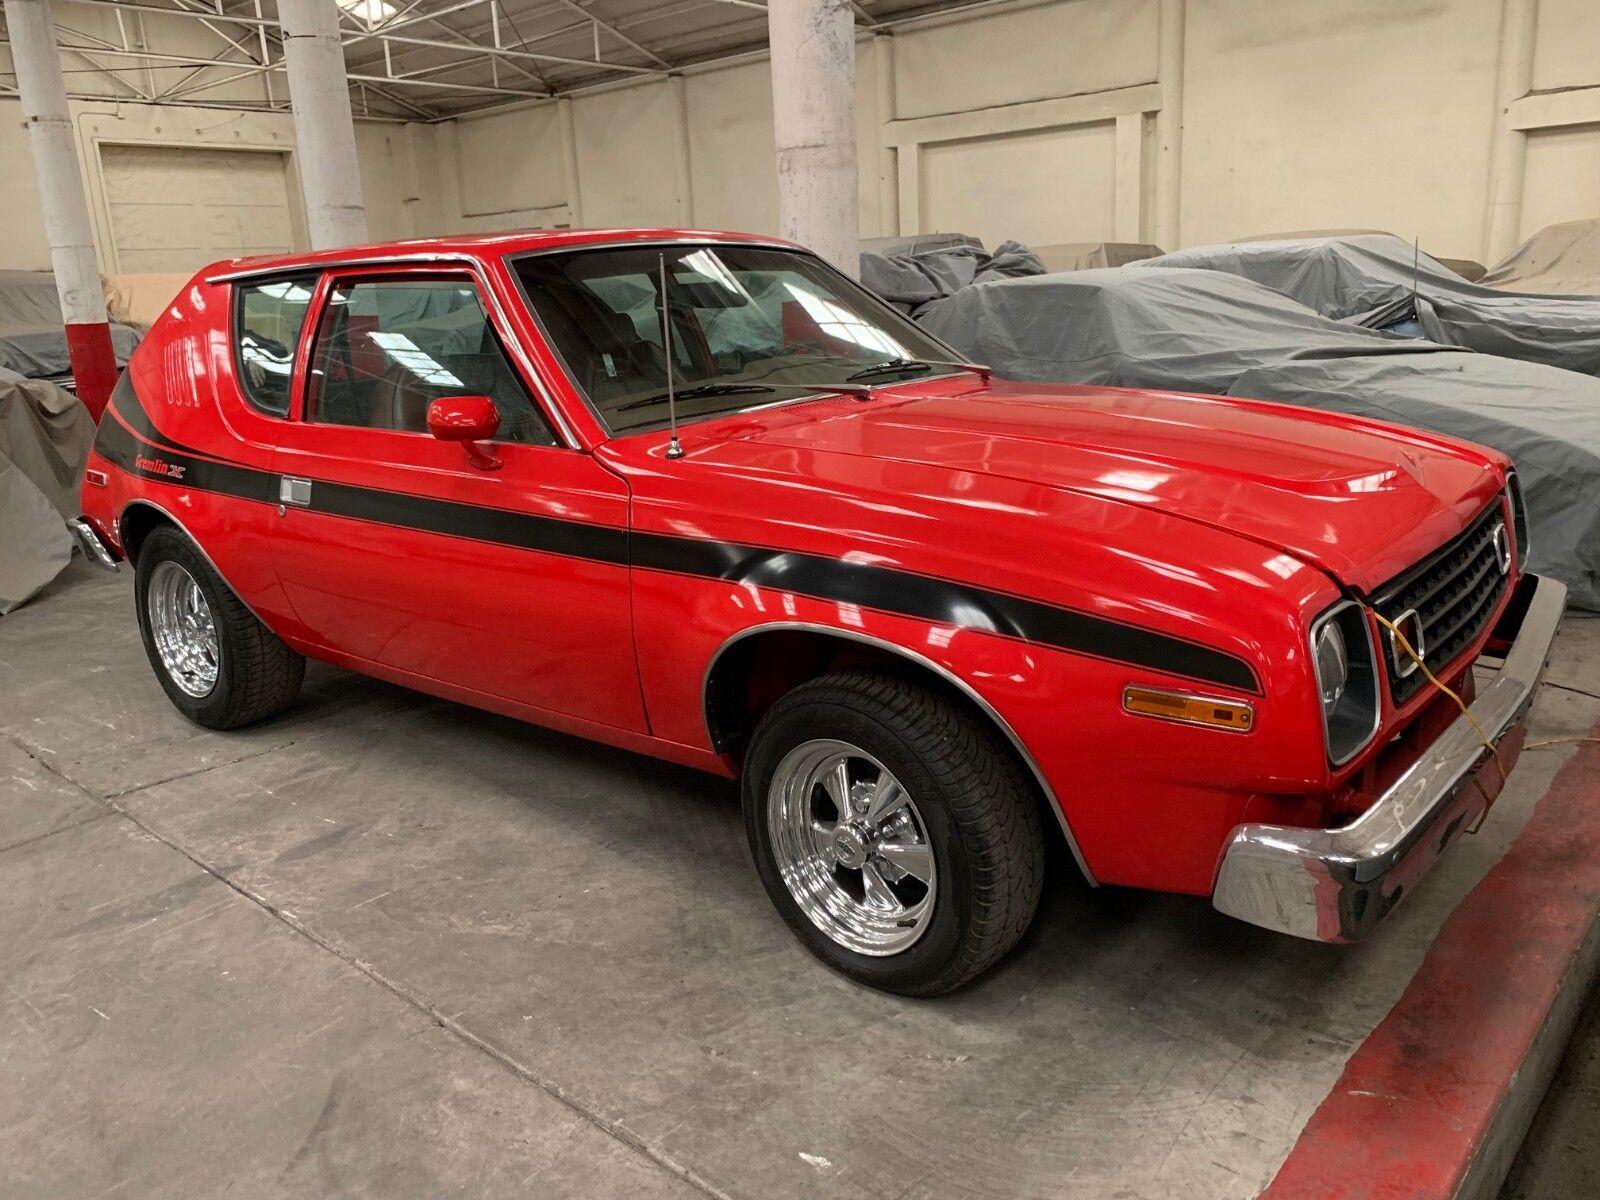 1977 AMC Gremlin X 1977 AMC Gremlin X